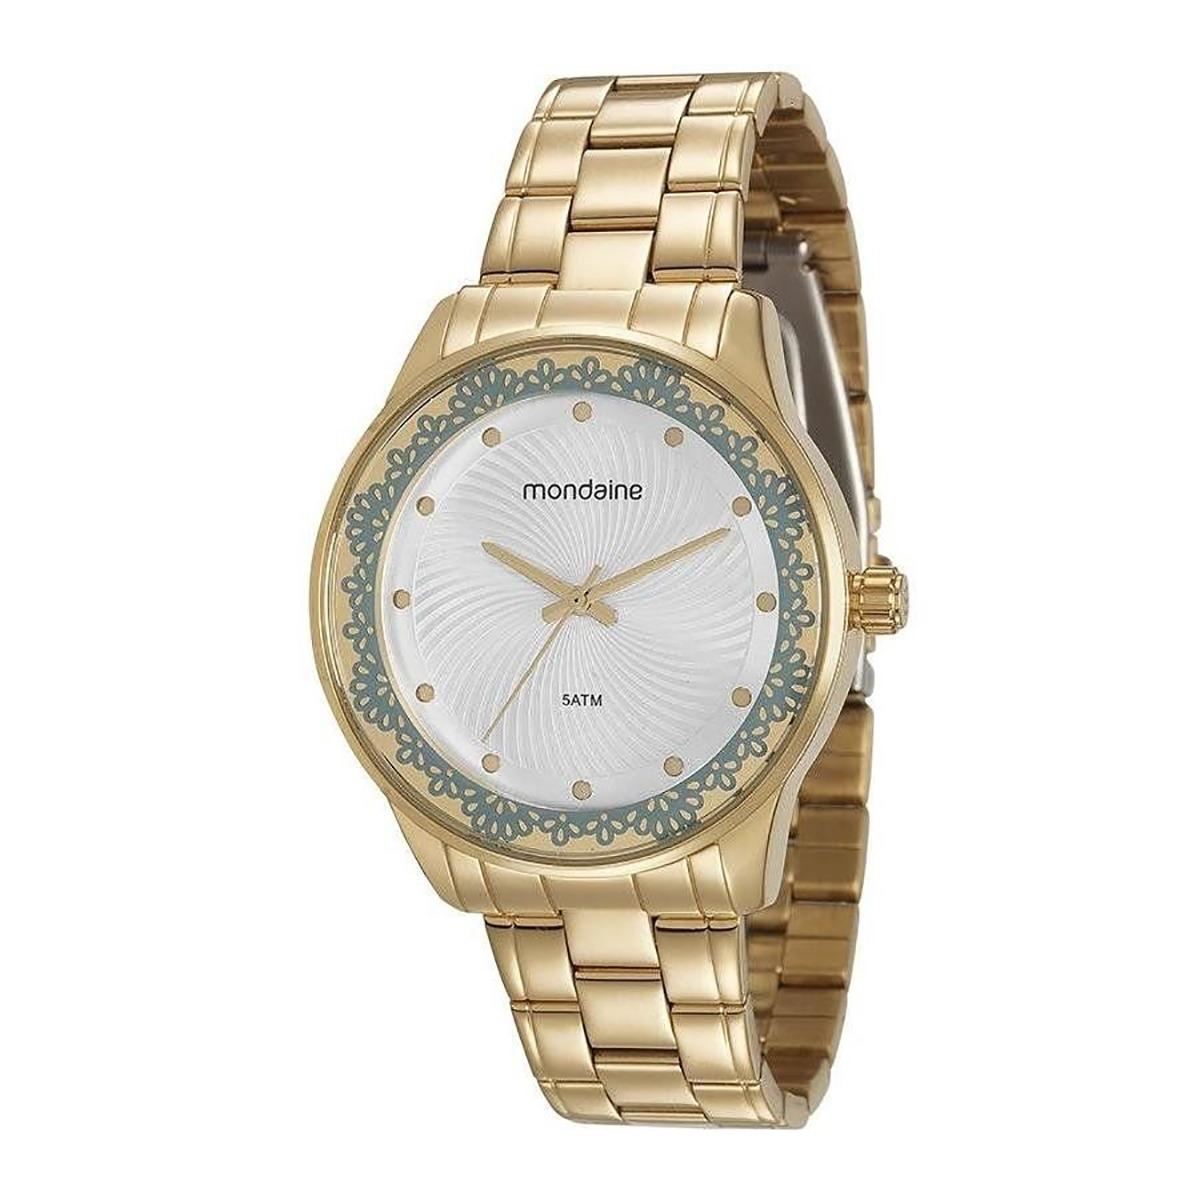 cfb18614fc6 Relógio Mondaine Feminino 99249lpmvde1 - R  189